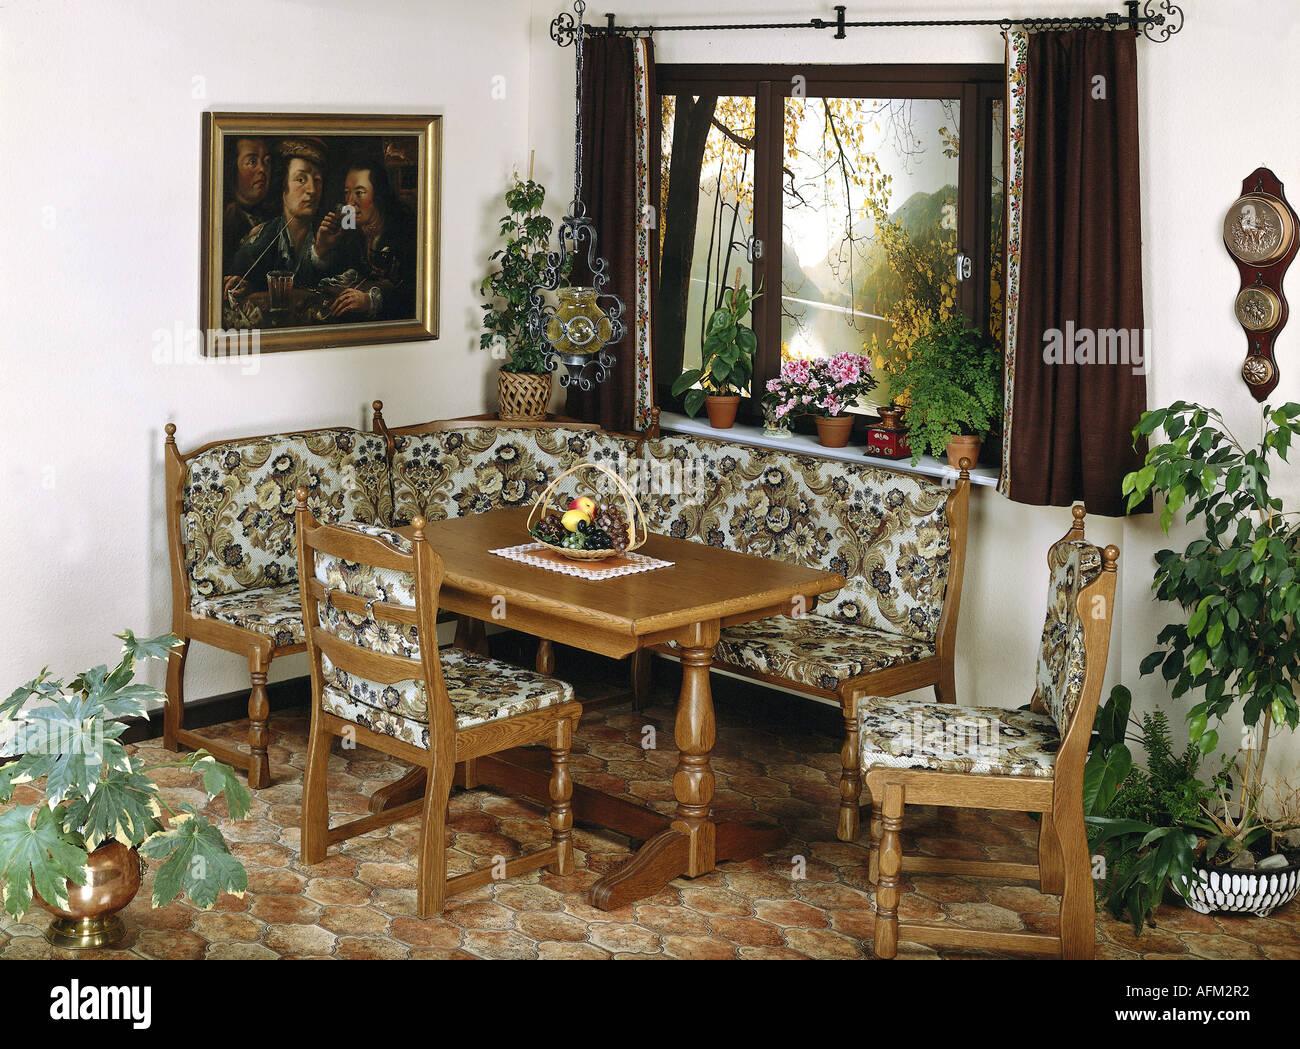 Muebles Comedor Rinconera 70s 70s Hist Rico Hist Rico  # Muebles Historicos